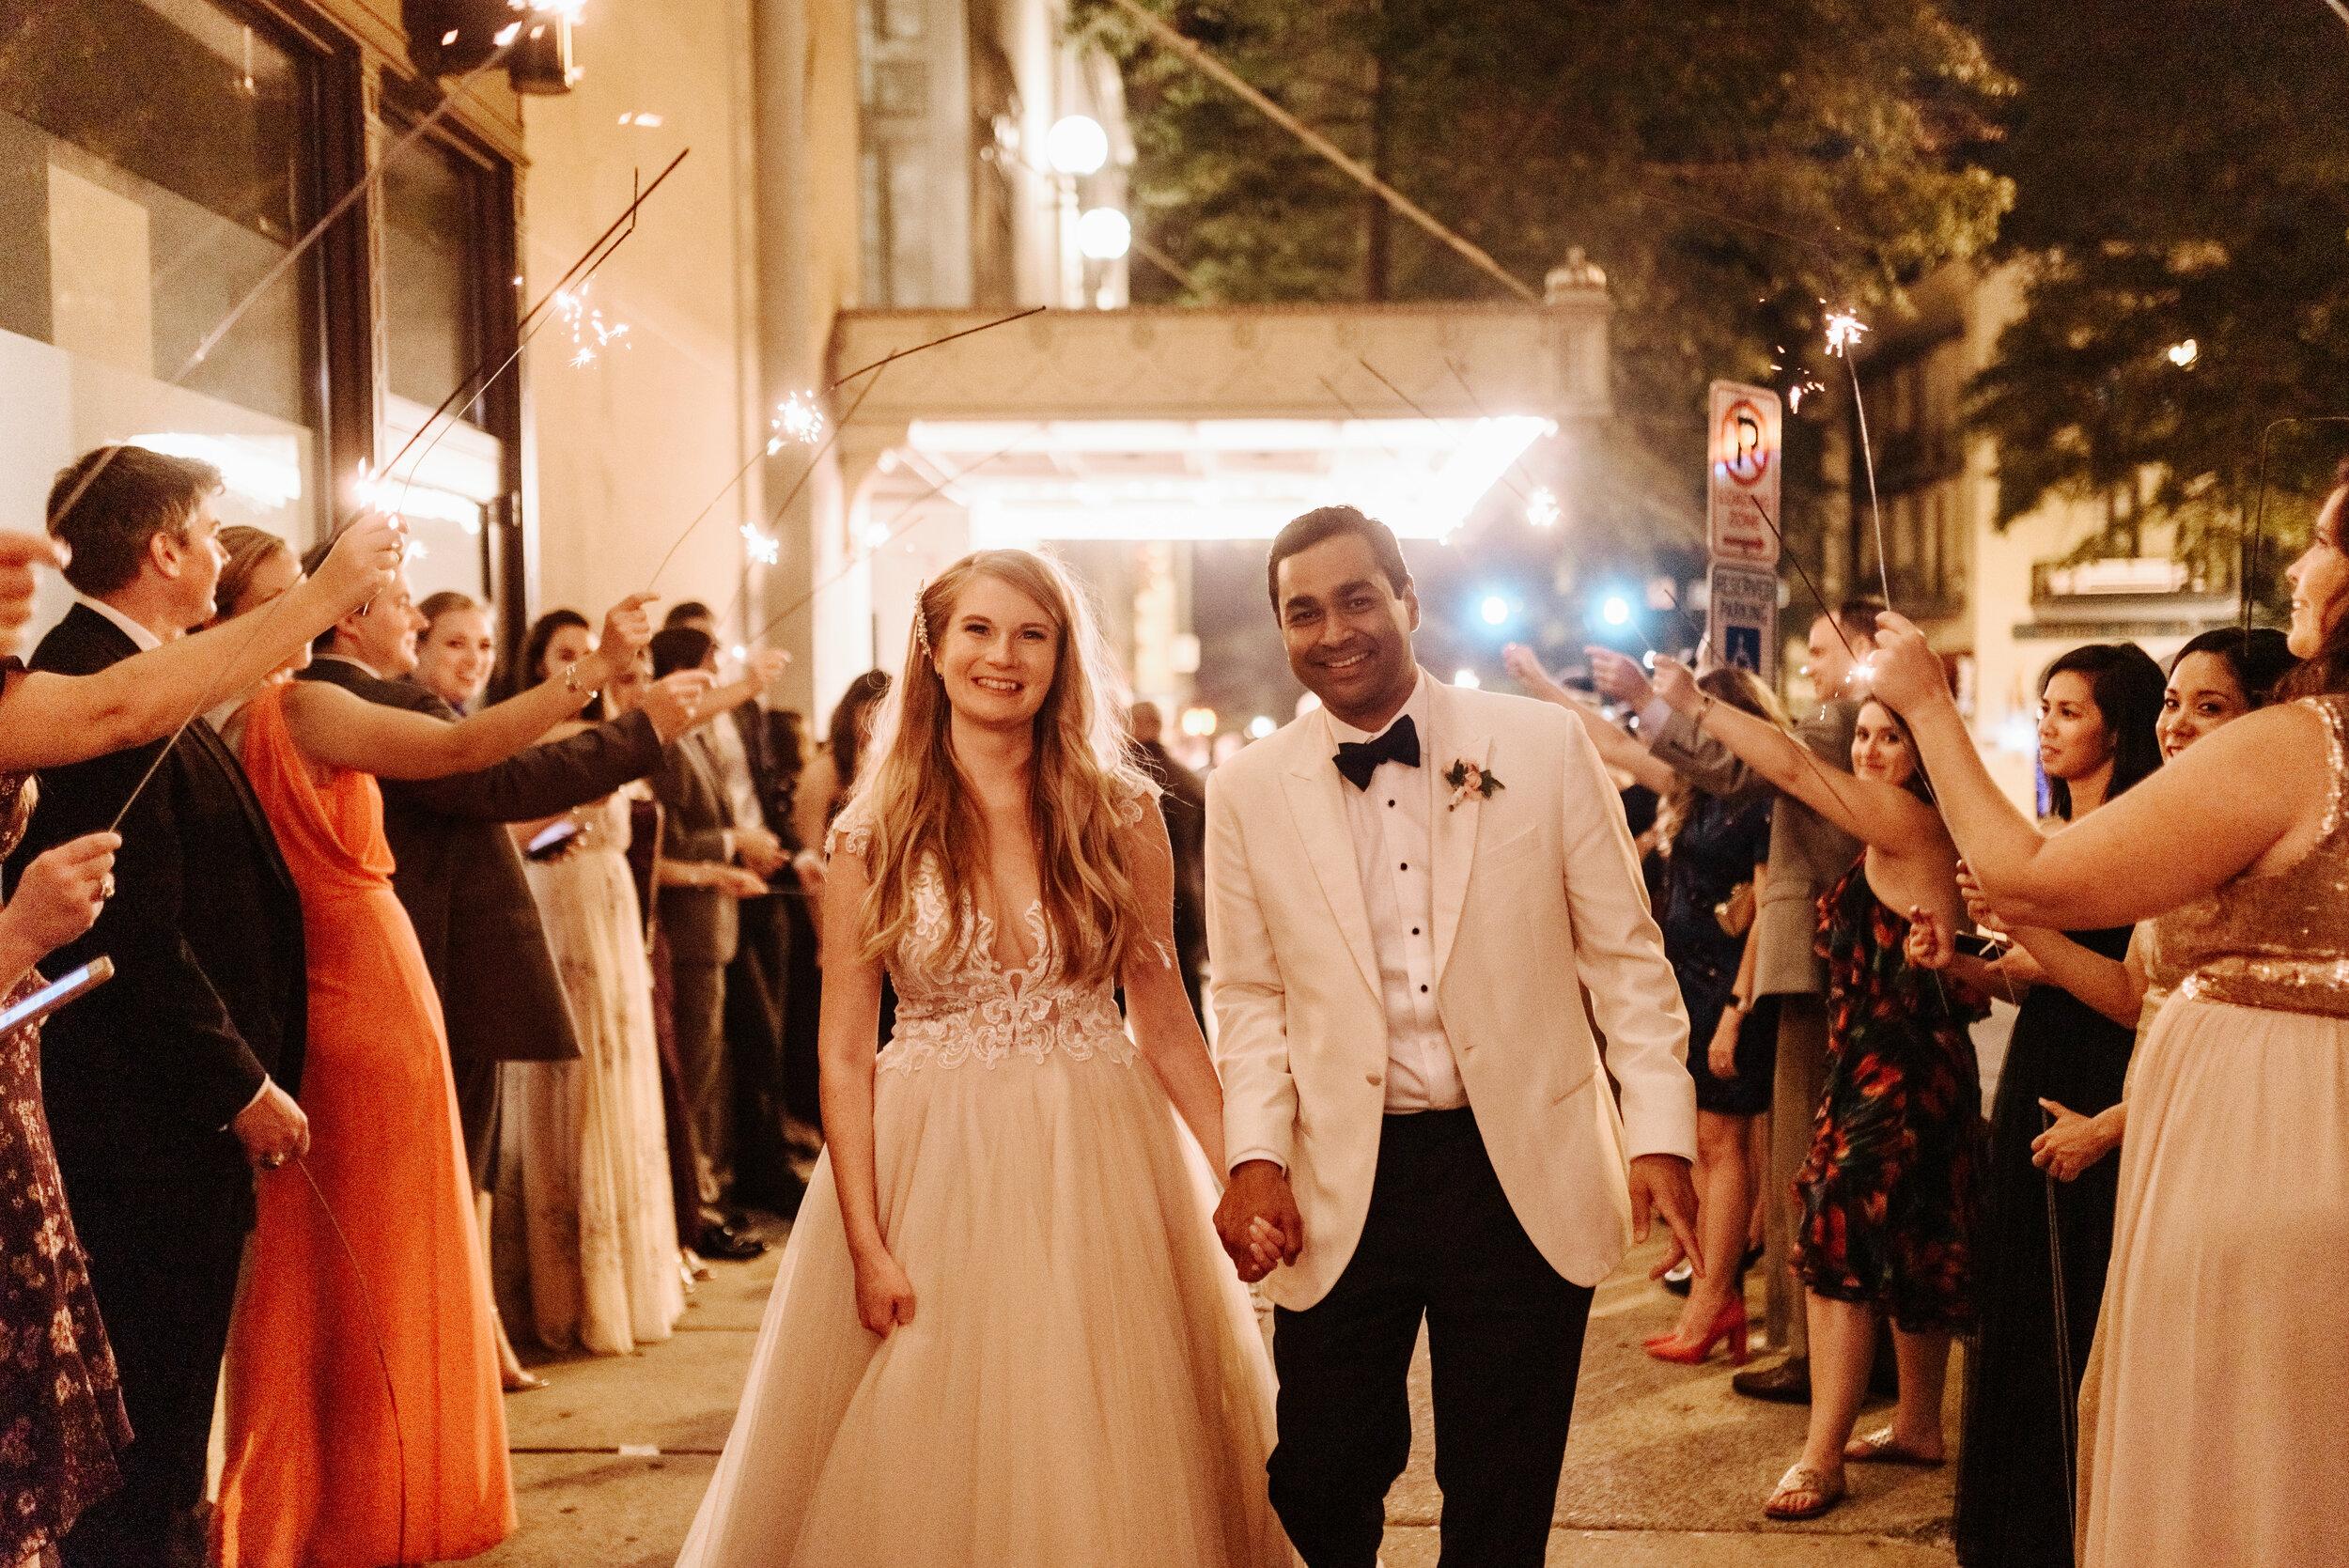 Cassie-Mrunal-Wedding-Quirk-Hotel-John-Marshall-Ballrooms-Richmond-Virginia-Photography-by-V-119.jpg